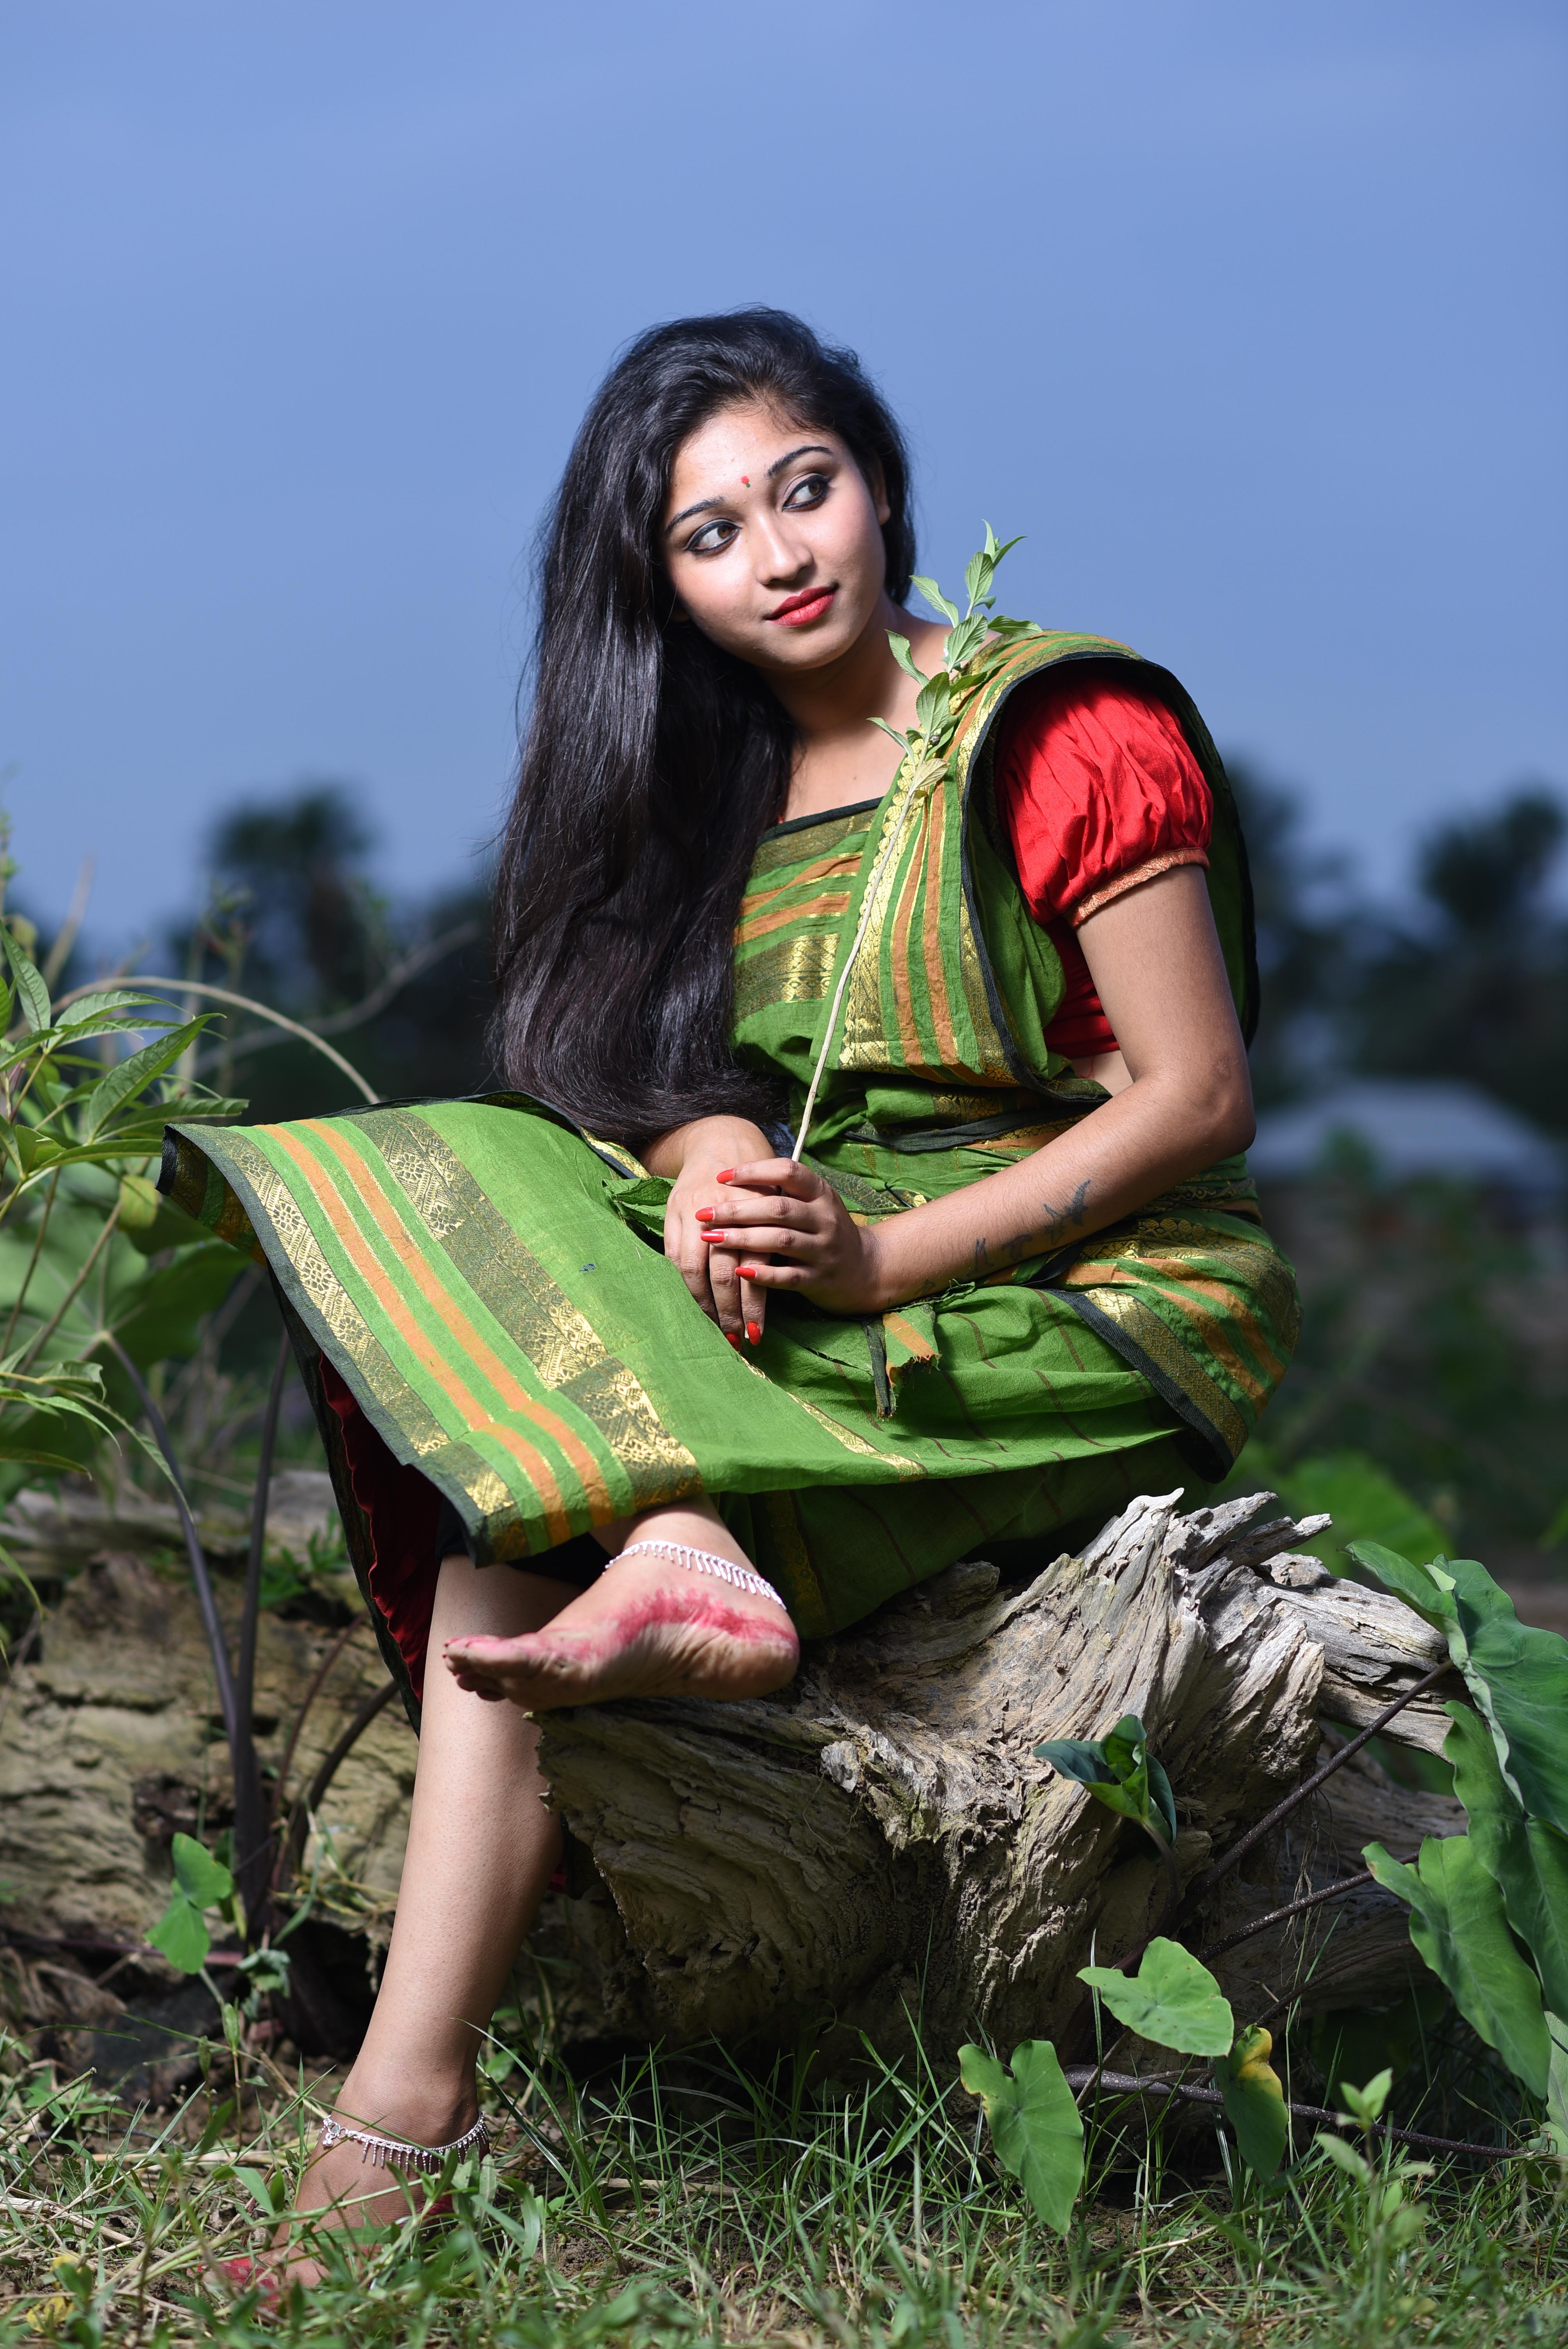 Joy Deb - Indian Photo Girl , HD Wallpaper & Backgrounds